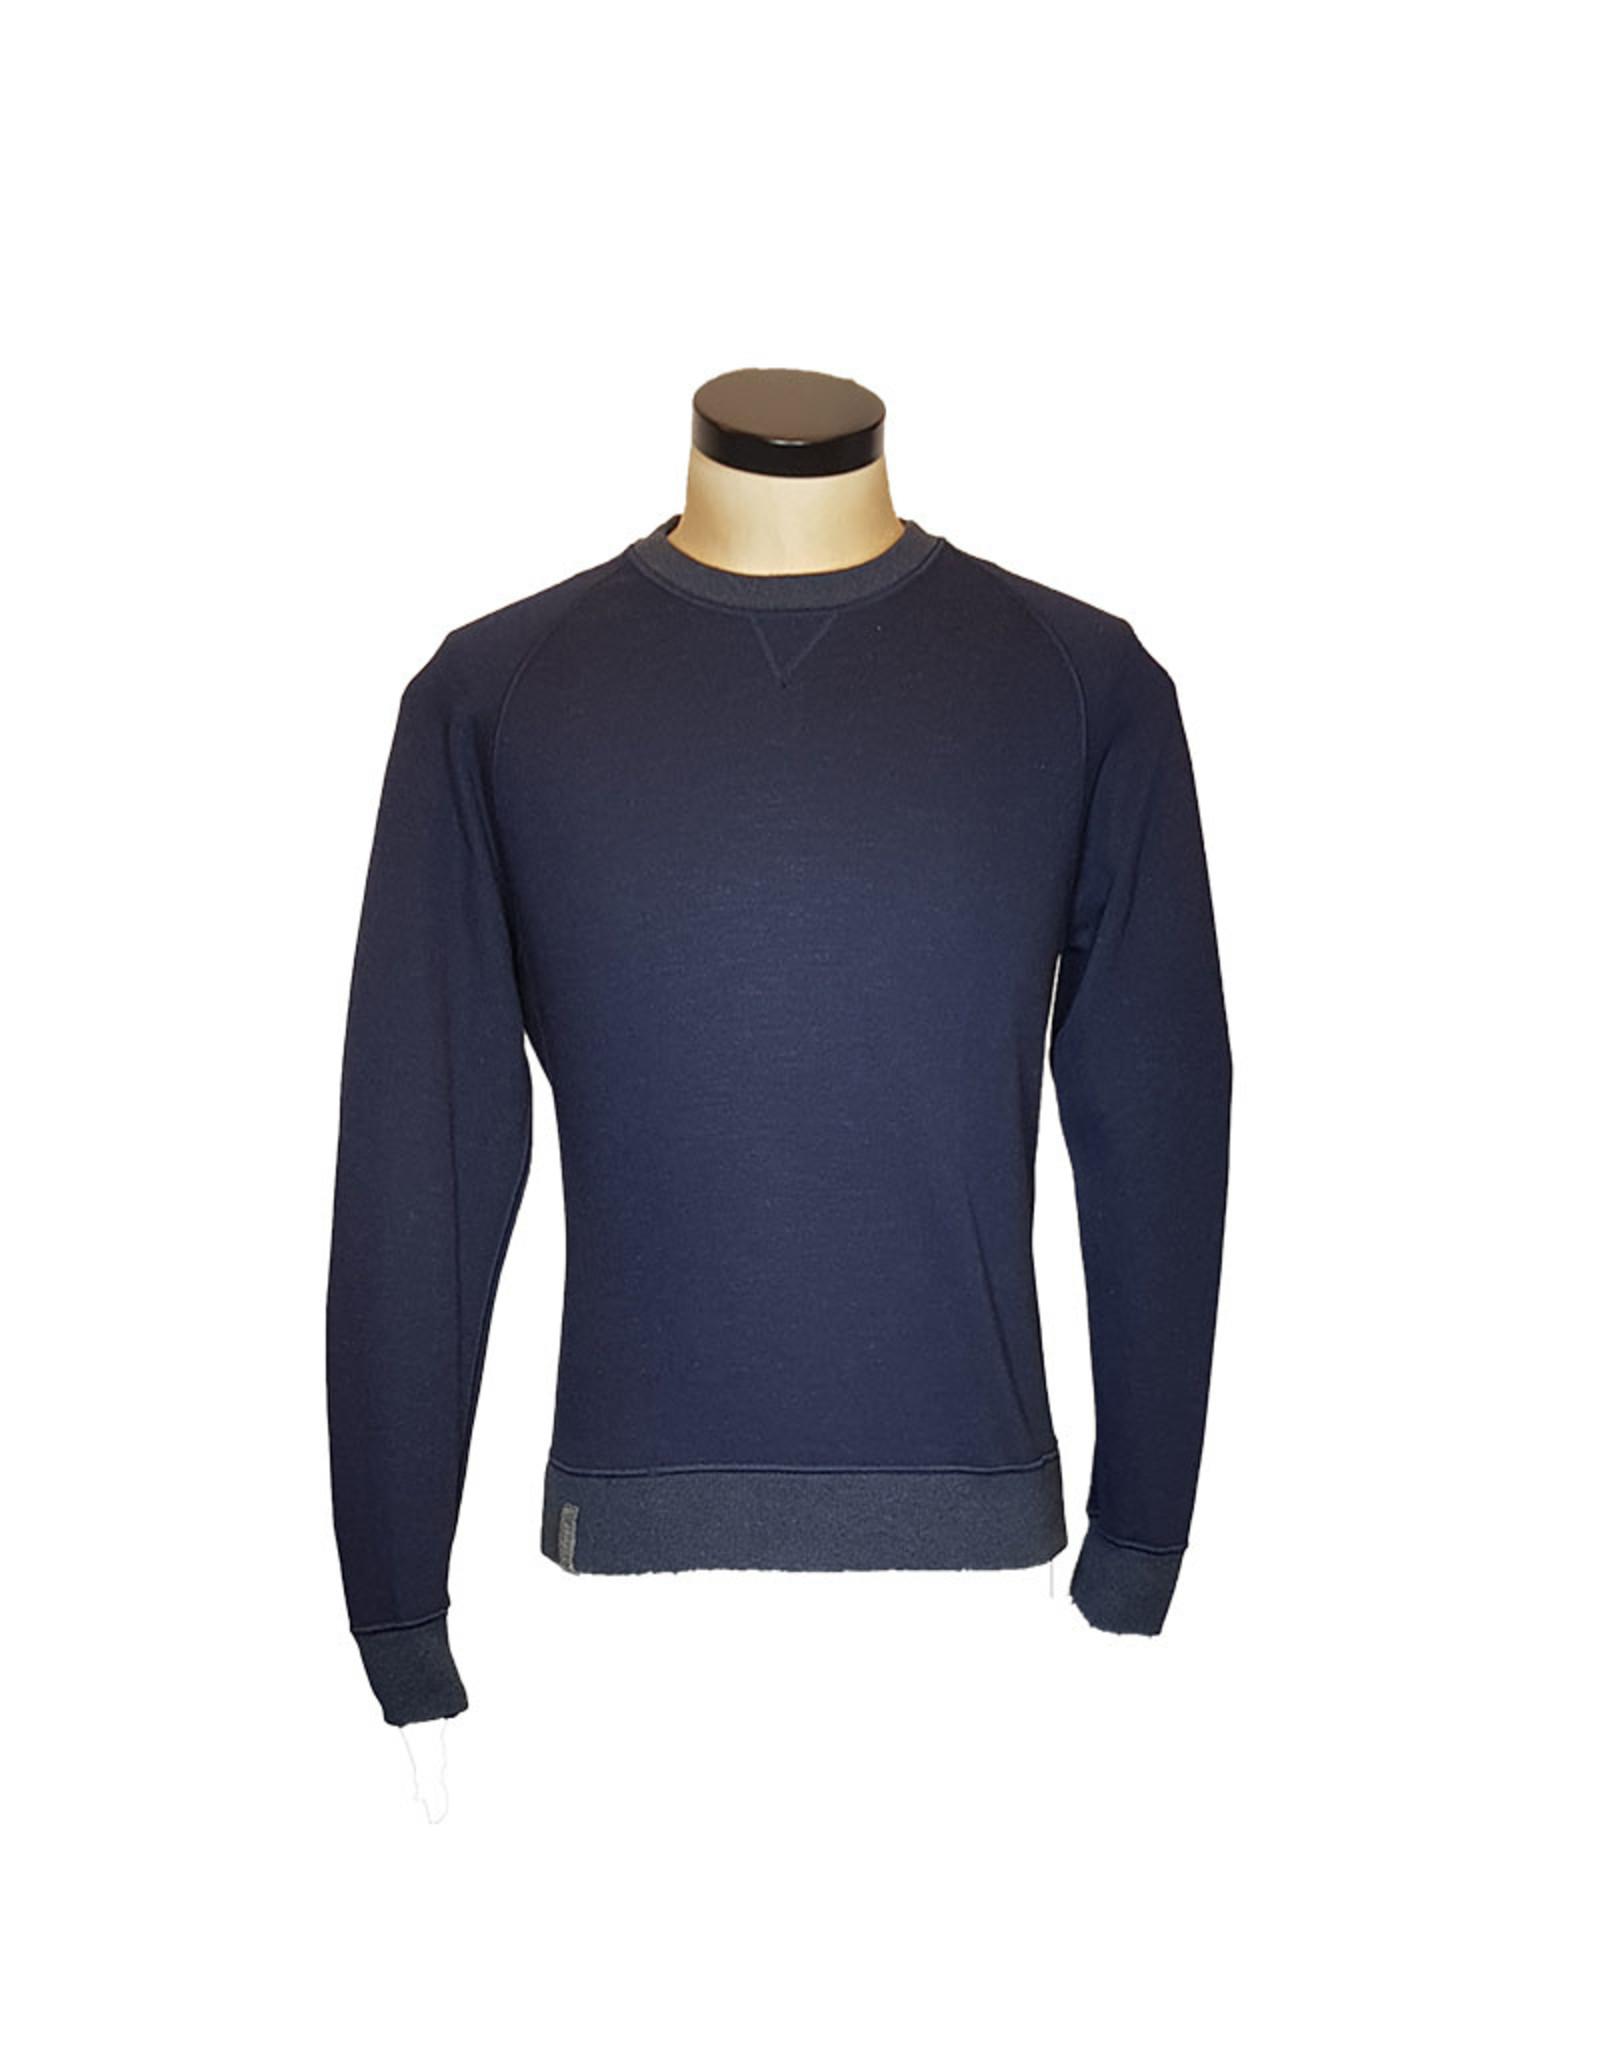 Capobianco Capobianco pull O-hals blauw-grijs 3M440.SP00/200